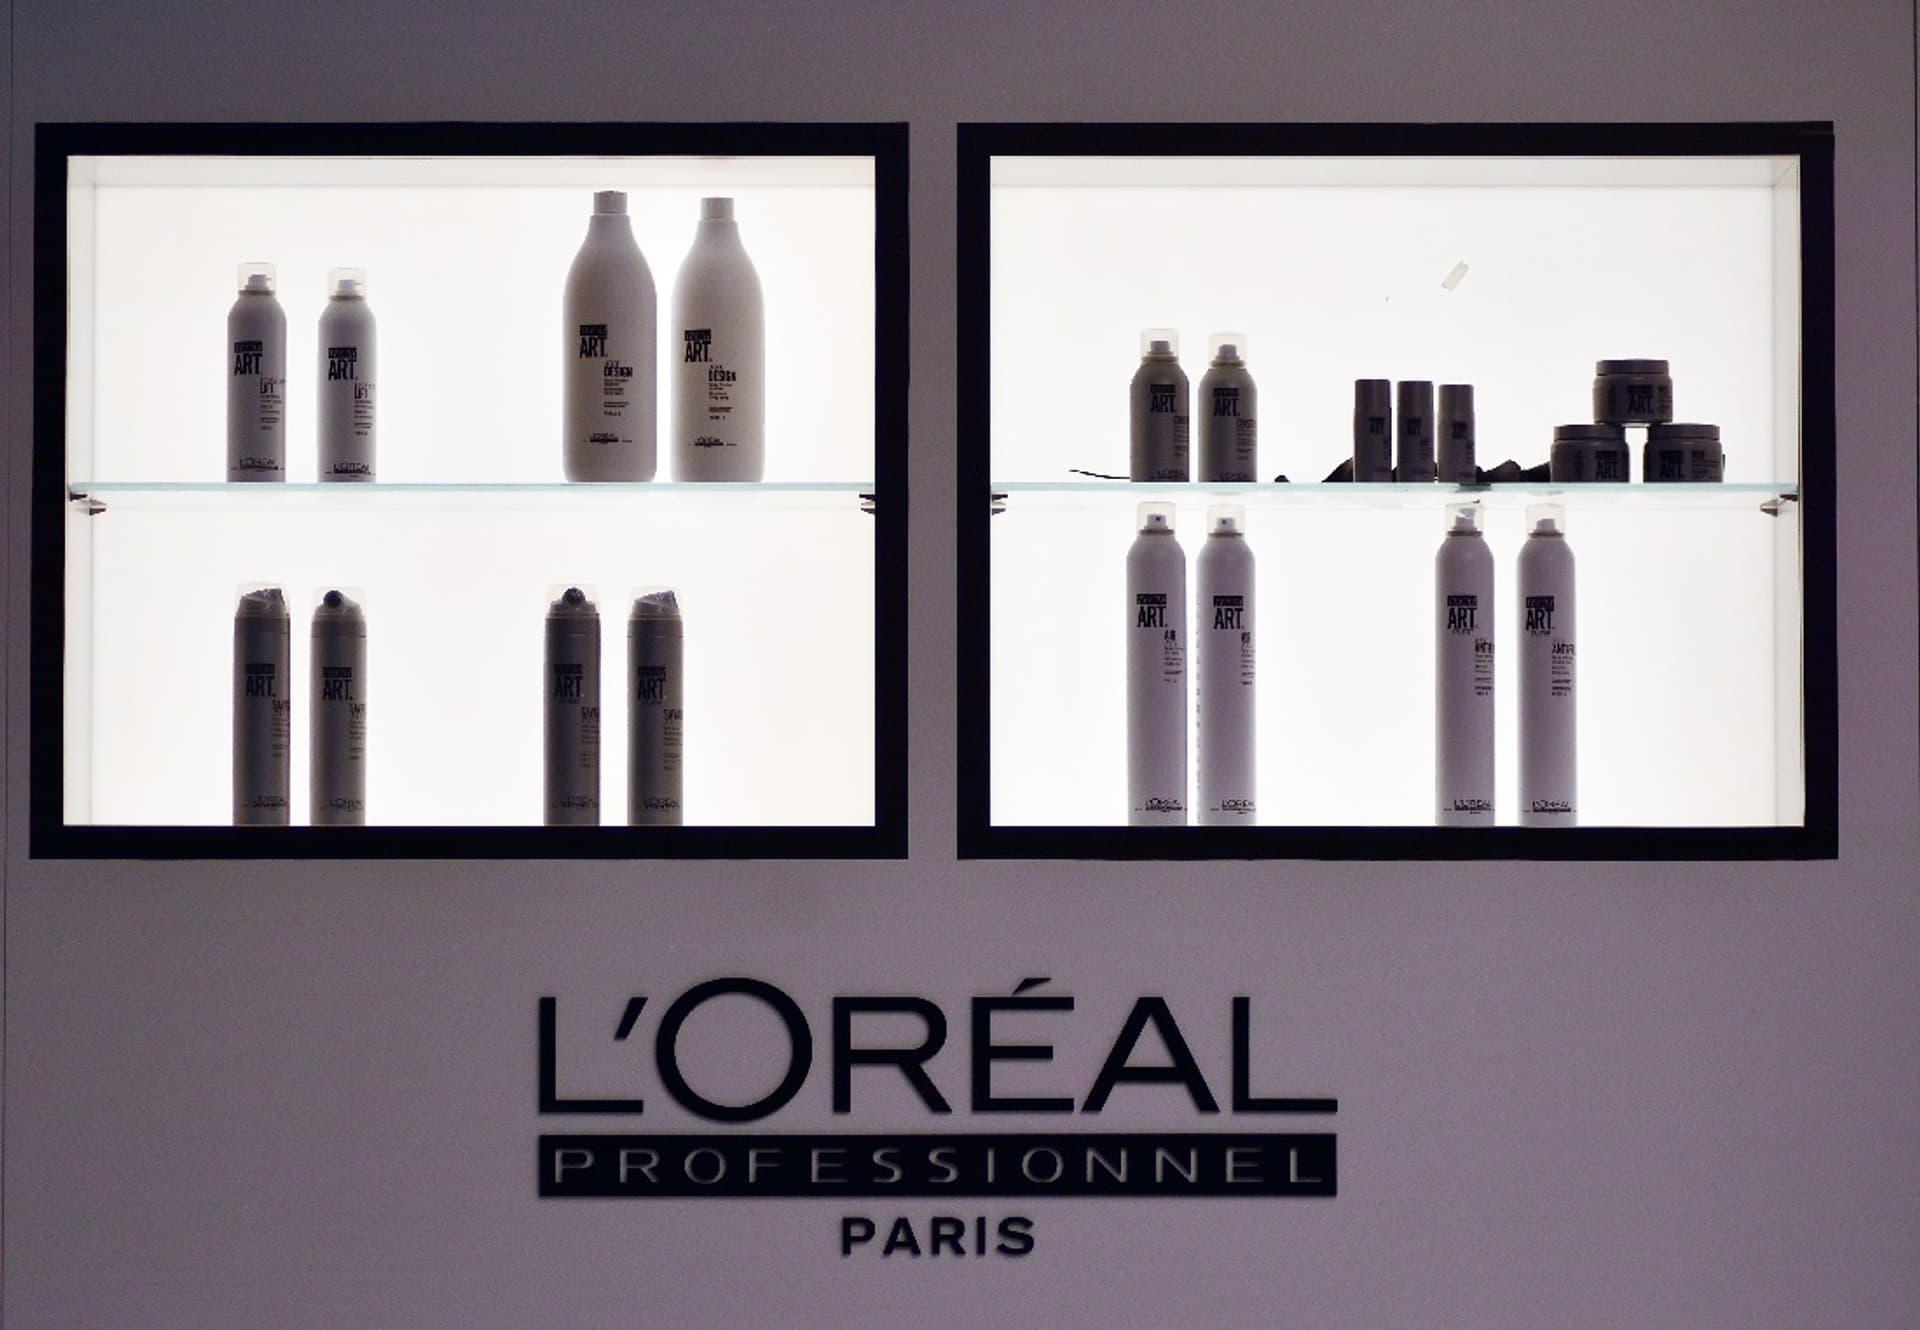 Vitrine mit L'Oreal-Kosmetik